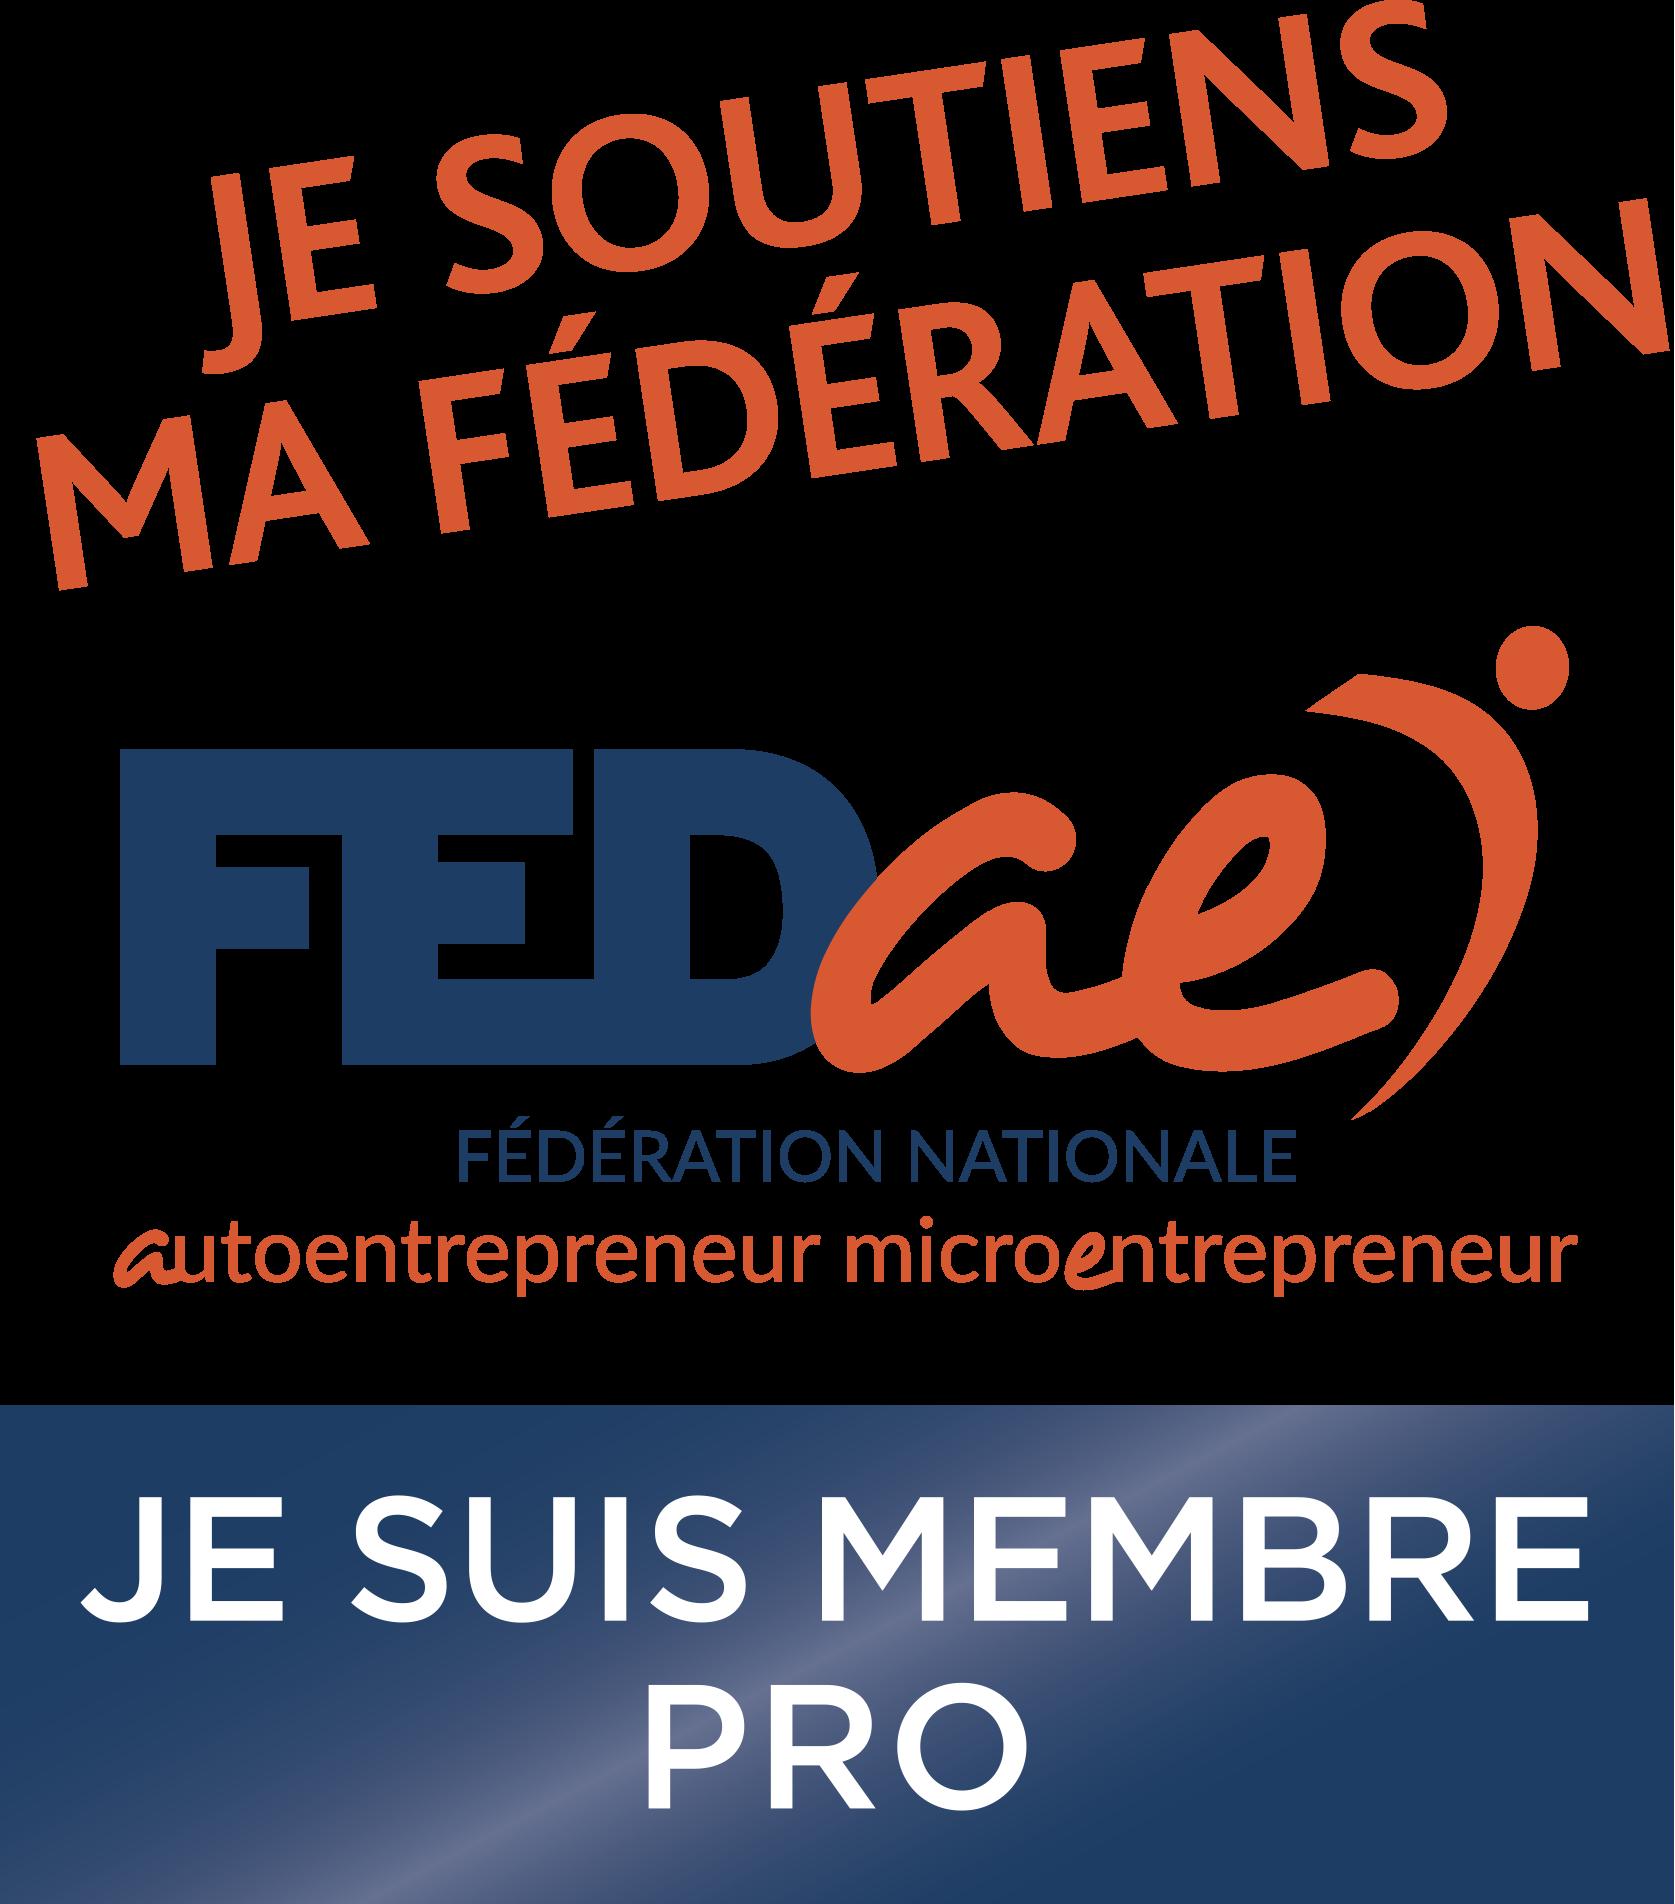 logo_soutien_fed-ae_pro-vertical_rvb_0